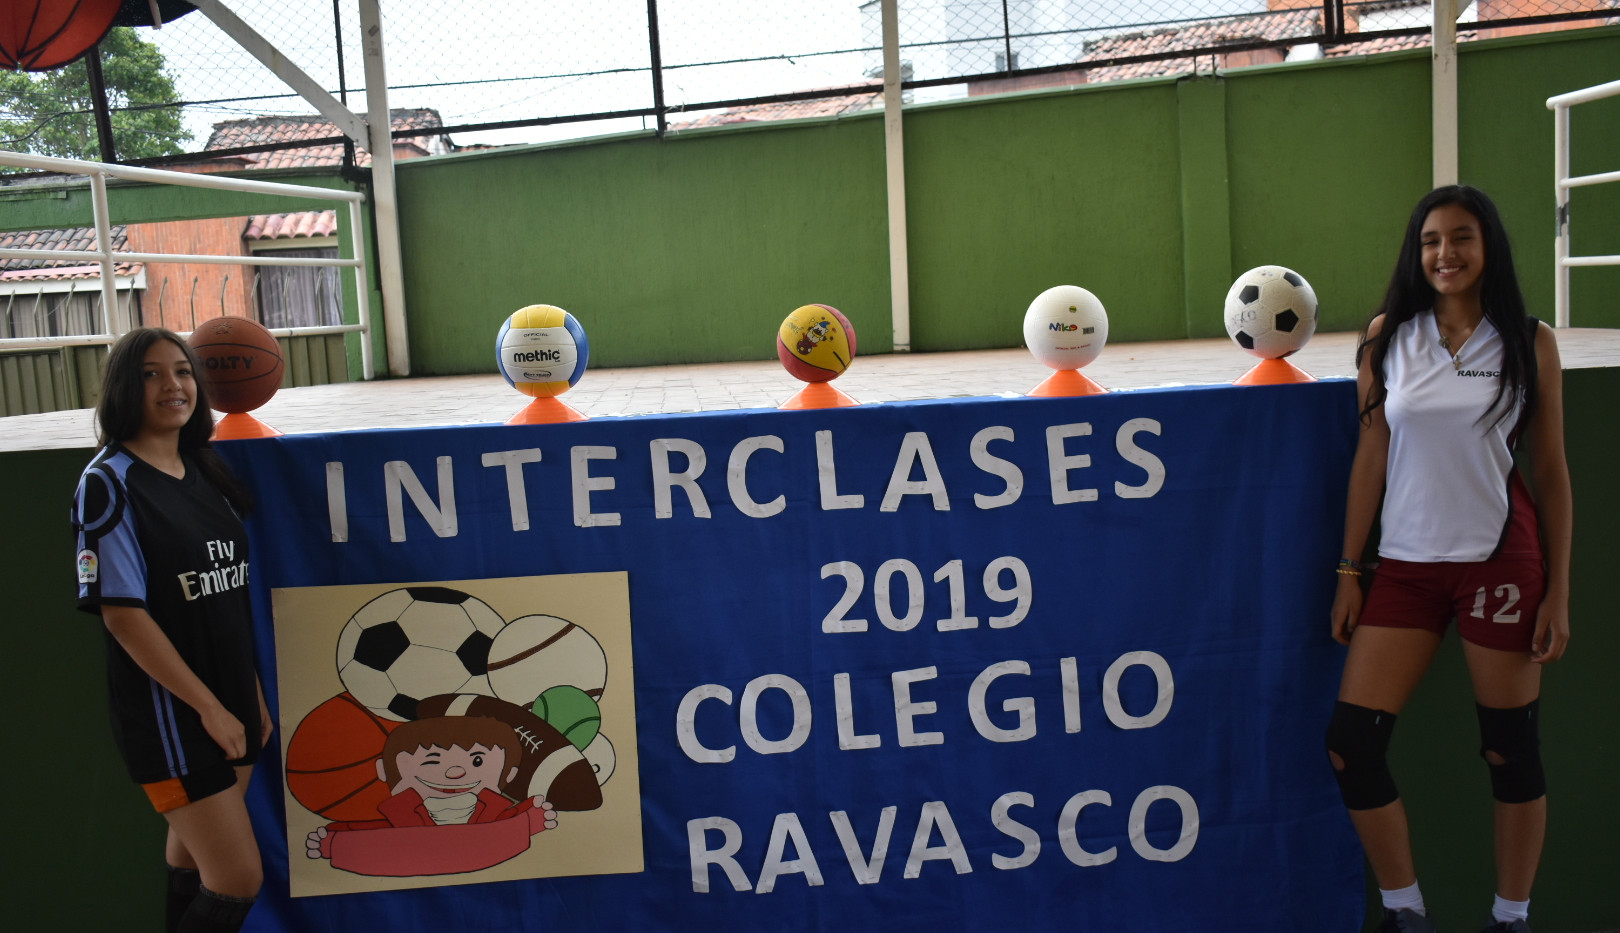 Interclases 2019